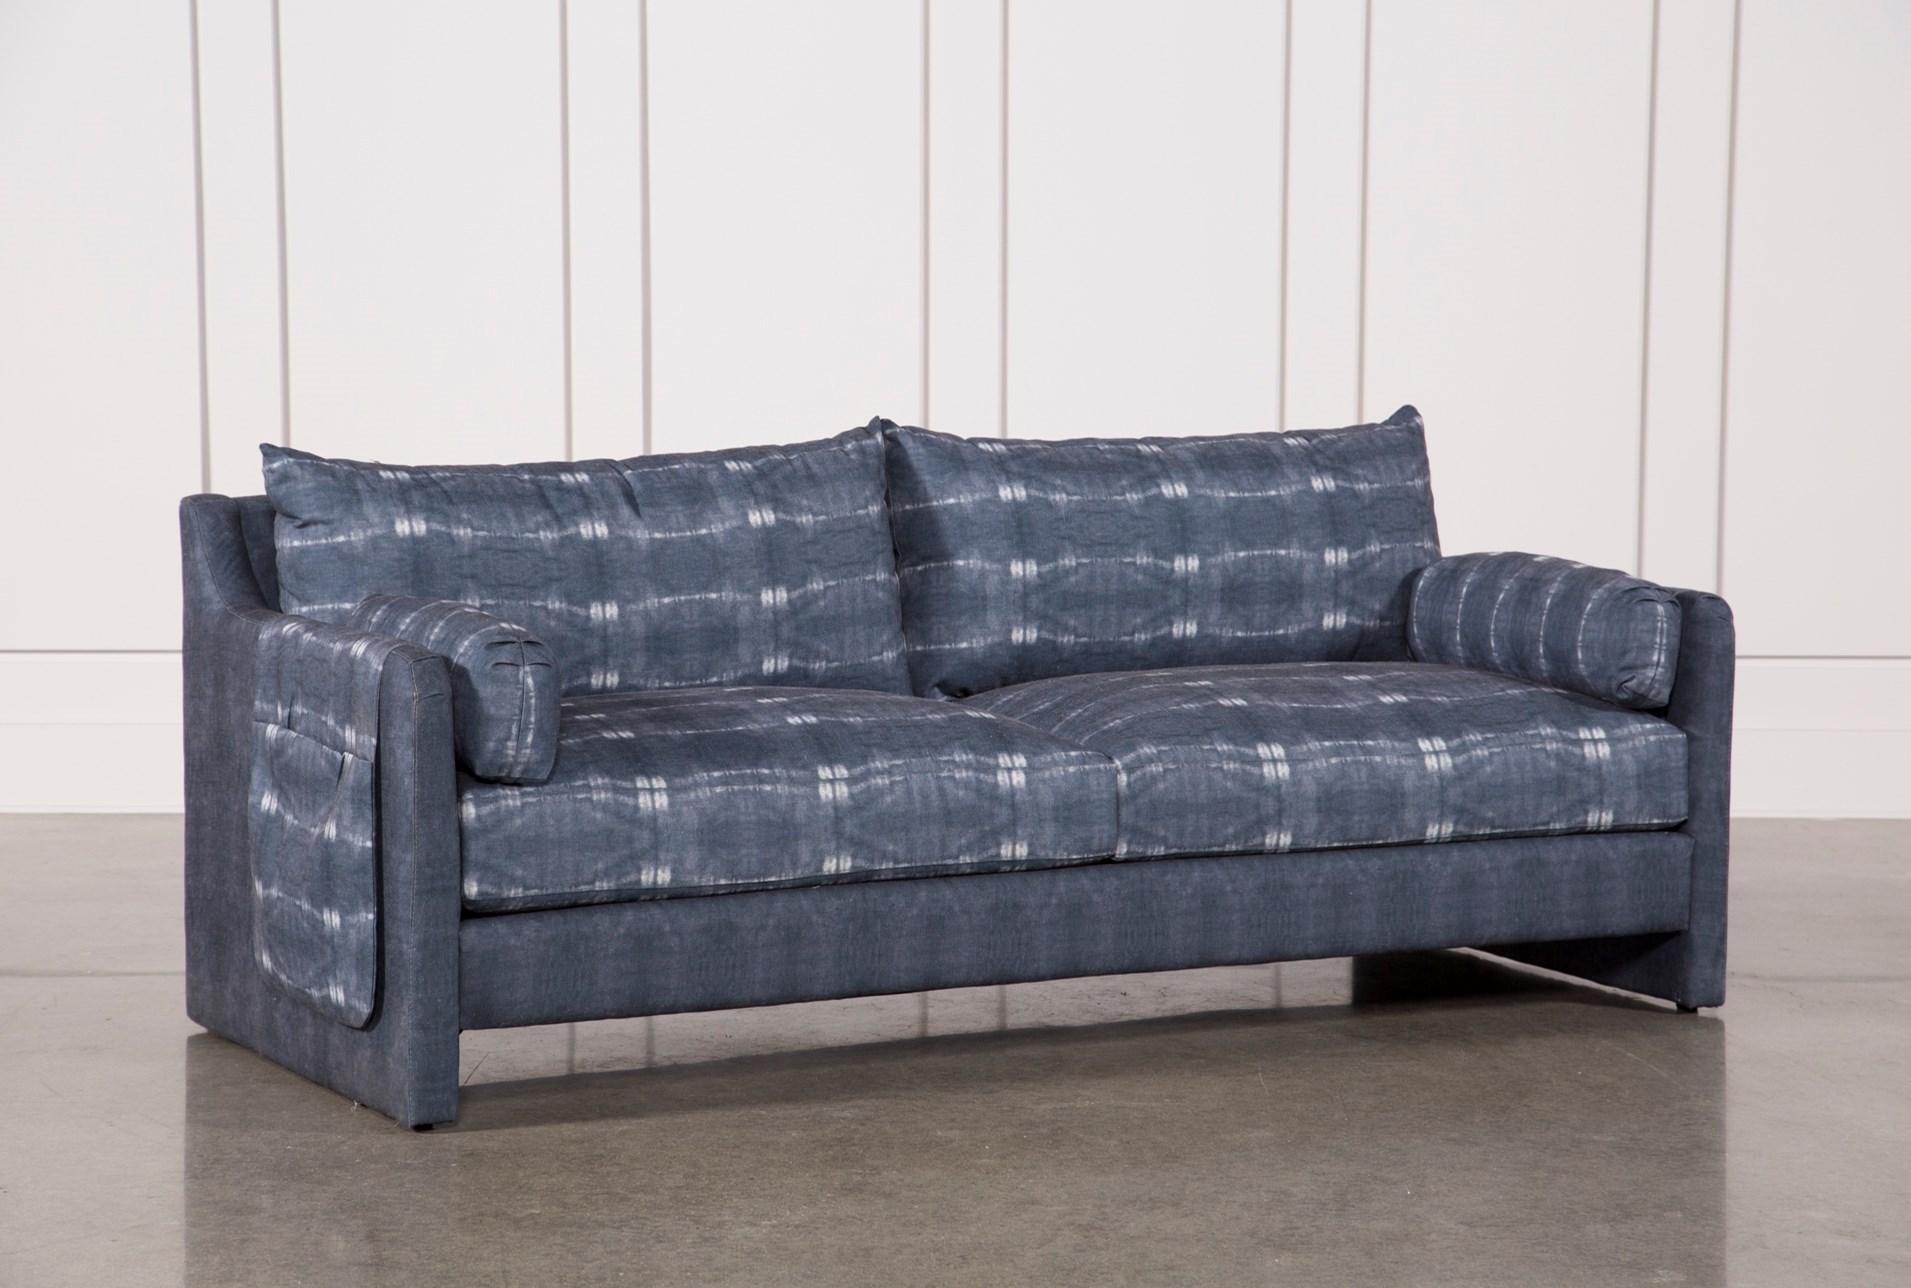 Justina Blakeney Les Chair | Living Spaces